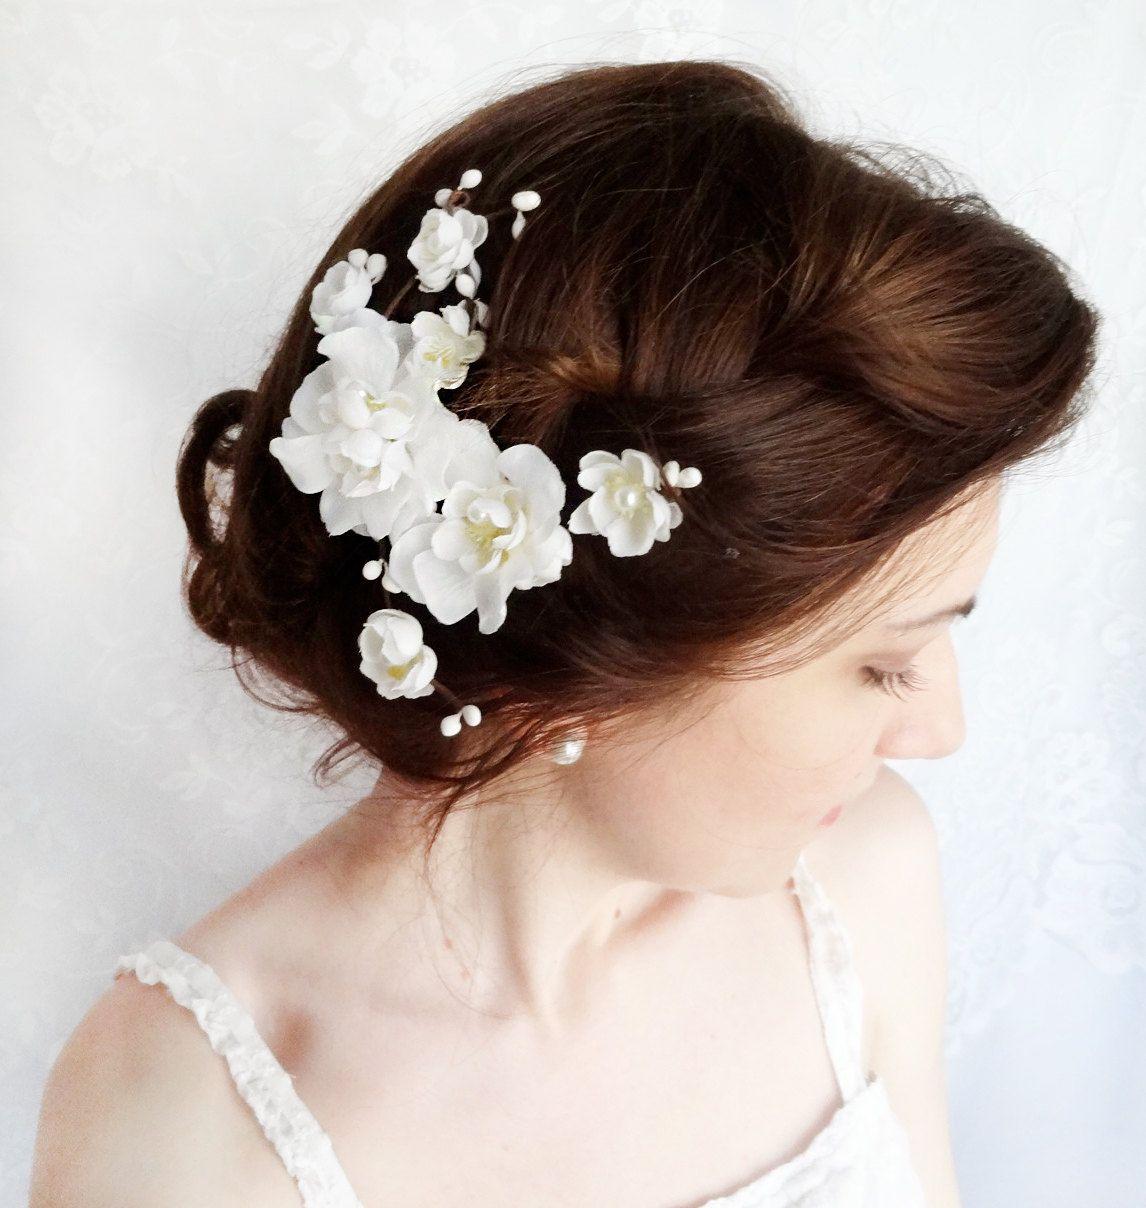 White Flower For Hair Bridal Hair Accessories Rustic Wedding